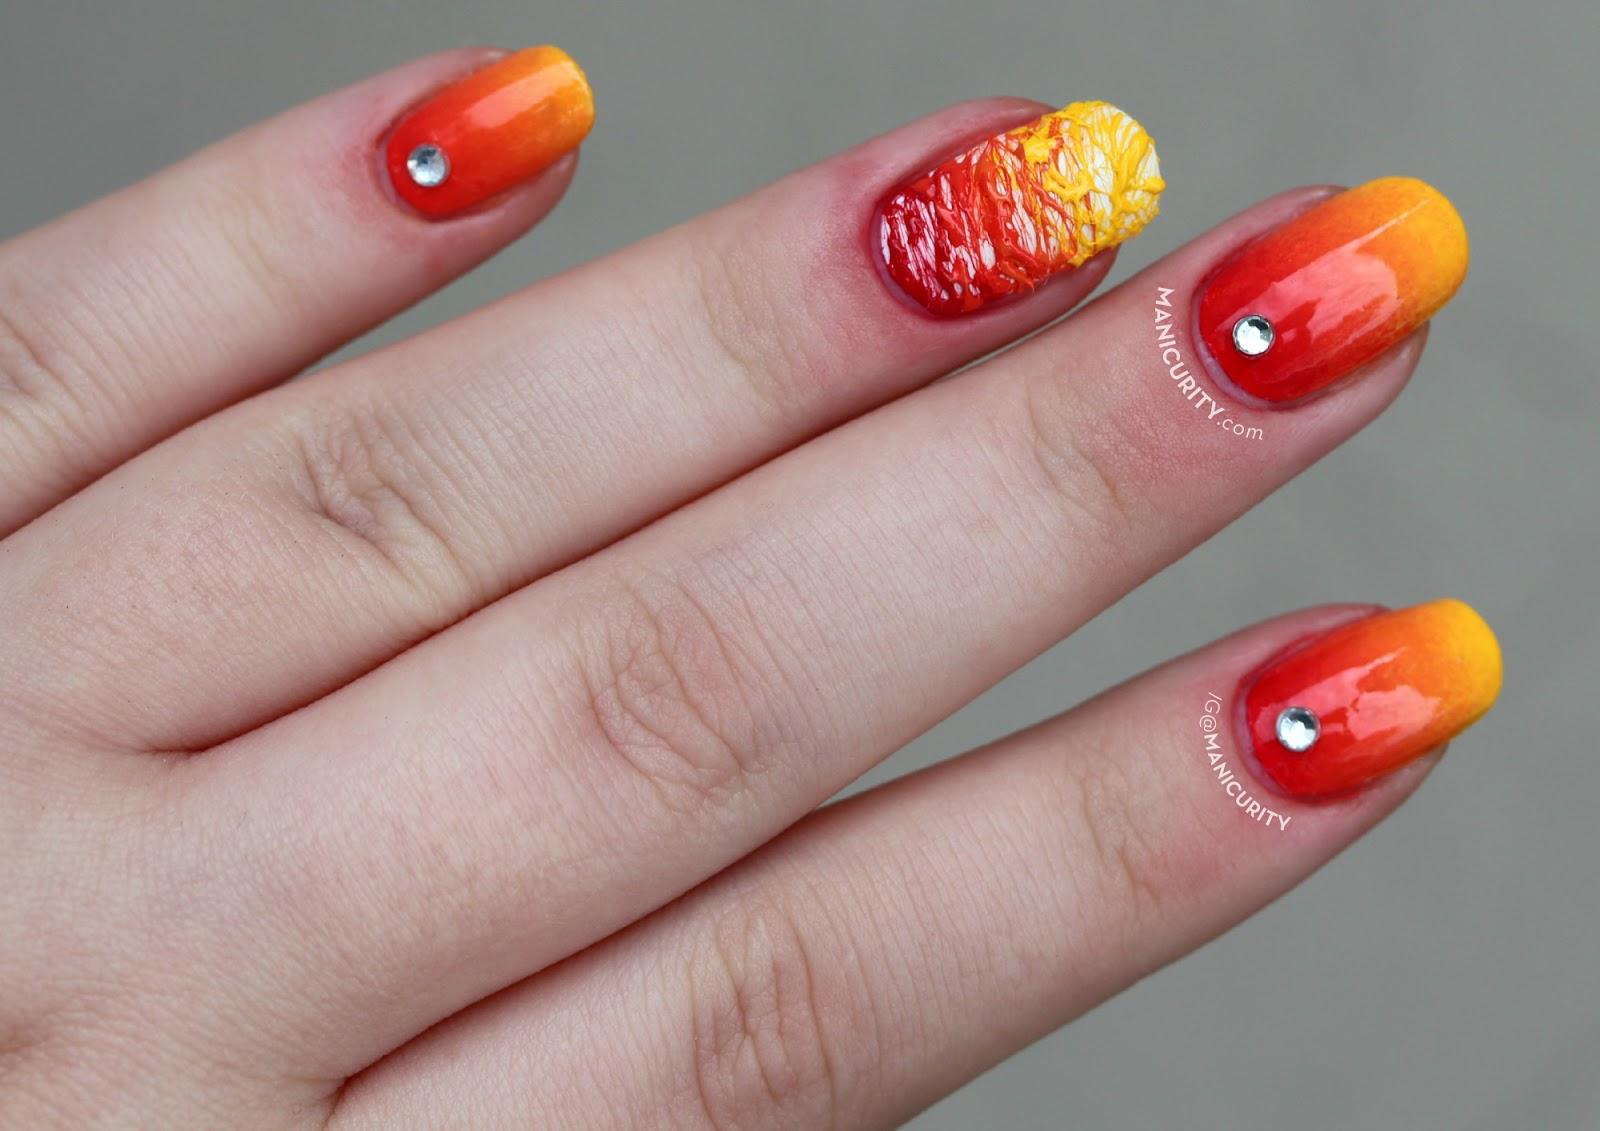 The Digit-al Dozen: Red Hot Sugar-Spun Gradient Nail Art | Manicurity